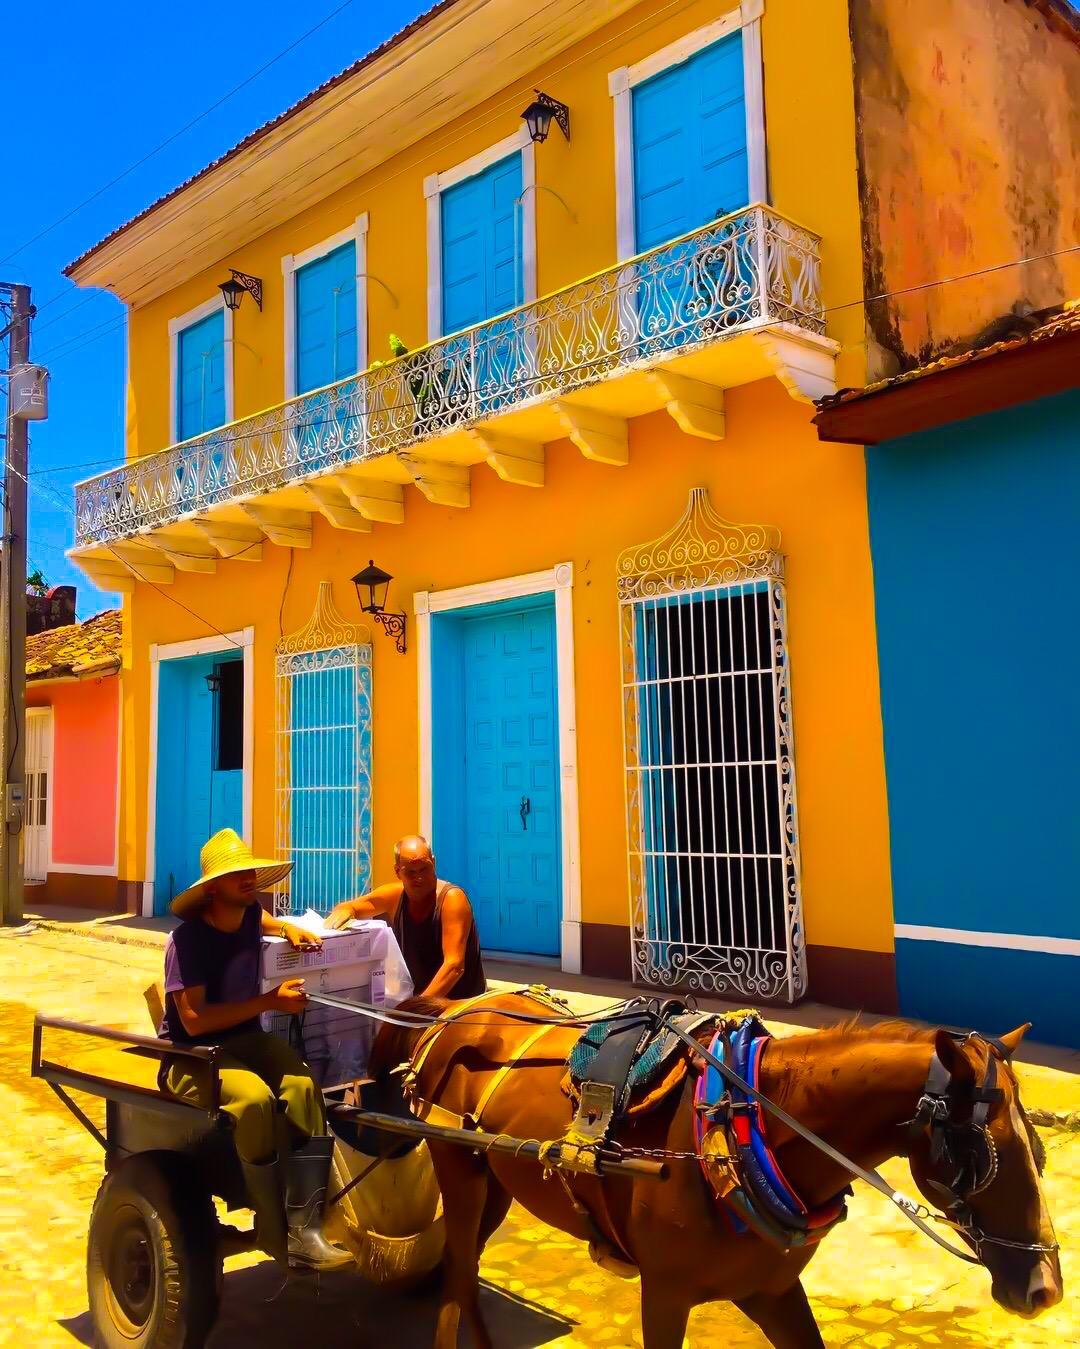 Trinidad_Cuba_colonial_architecture.JPEG